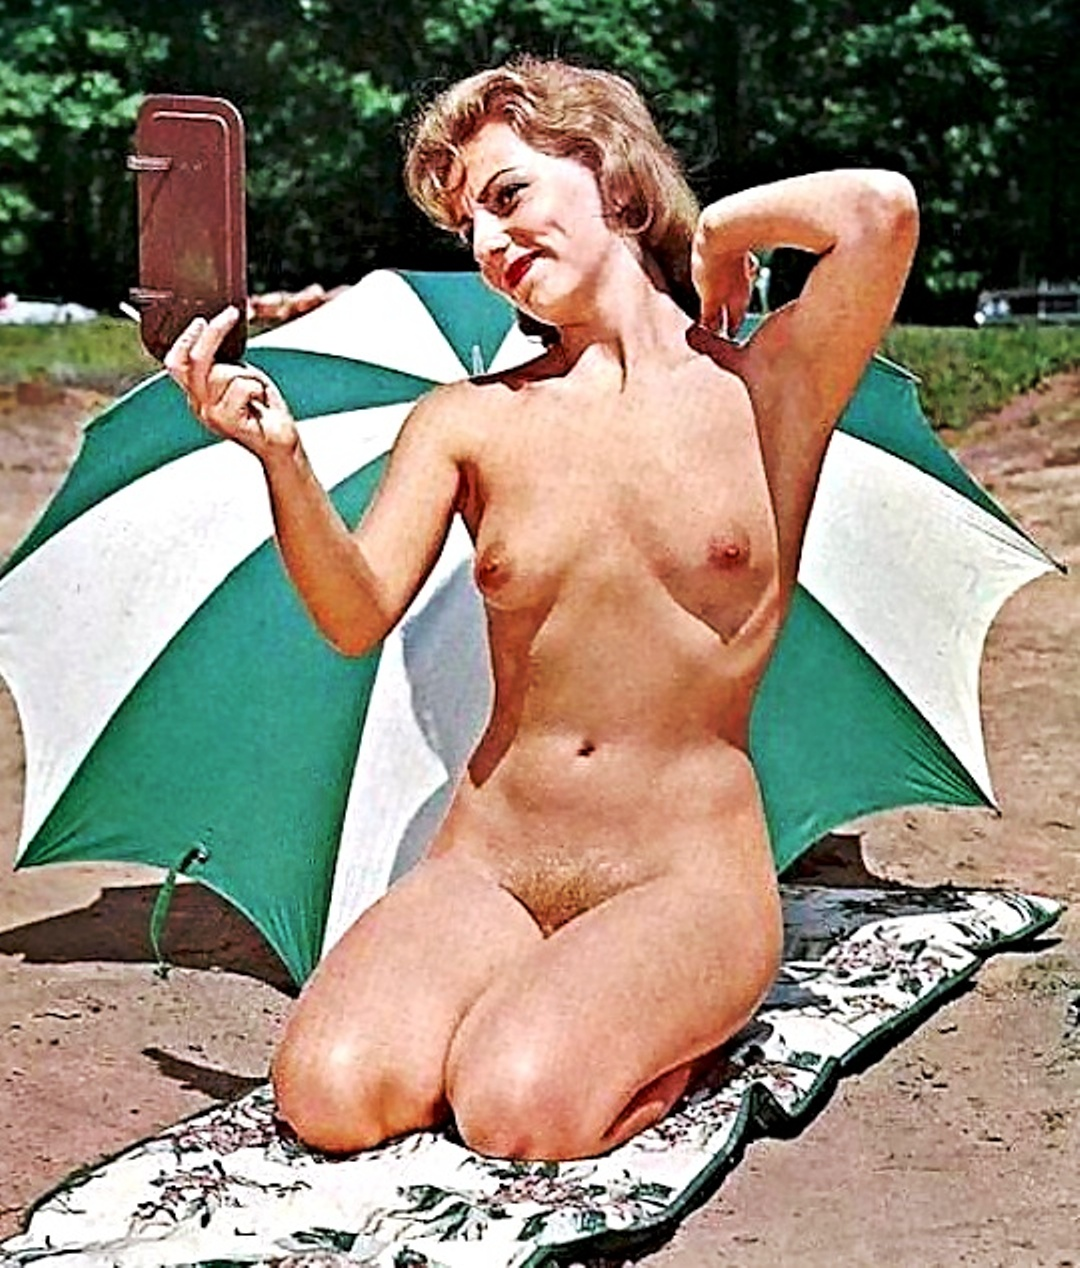 www.mx7.com nudism 9